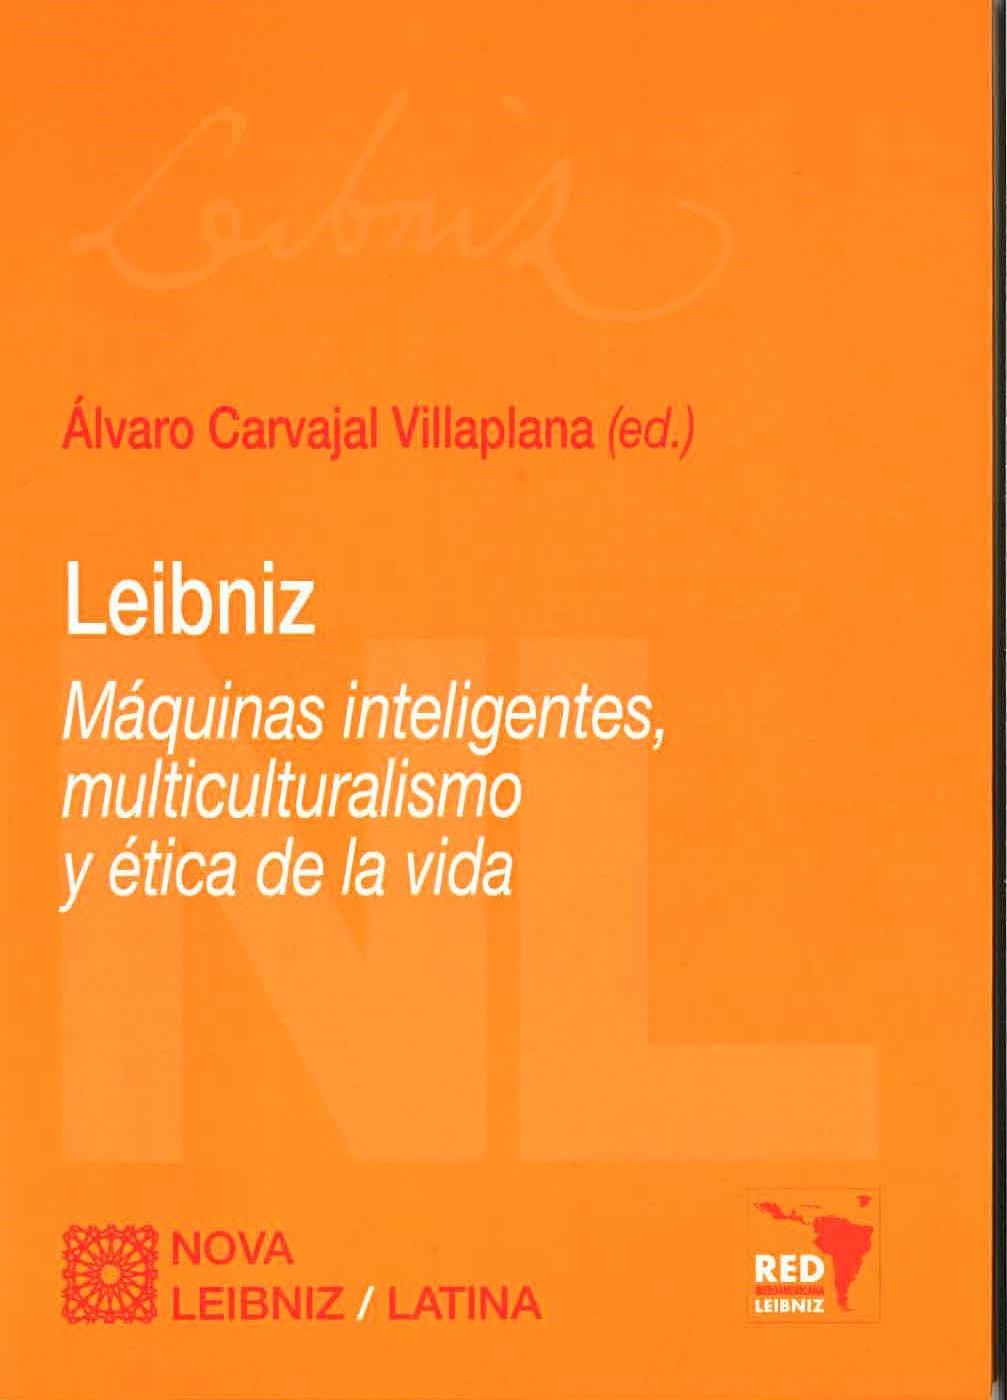 Nova Leibniz / LATINA